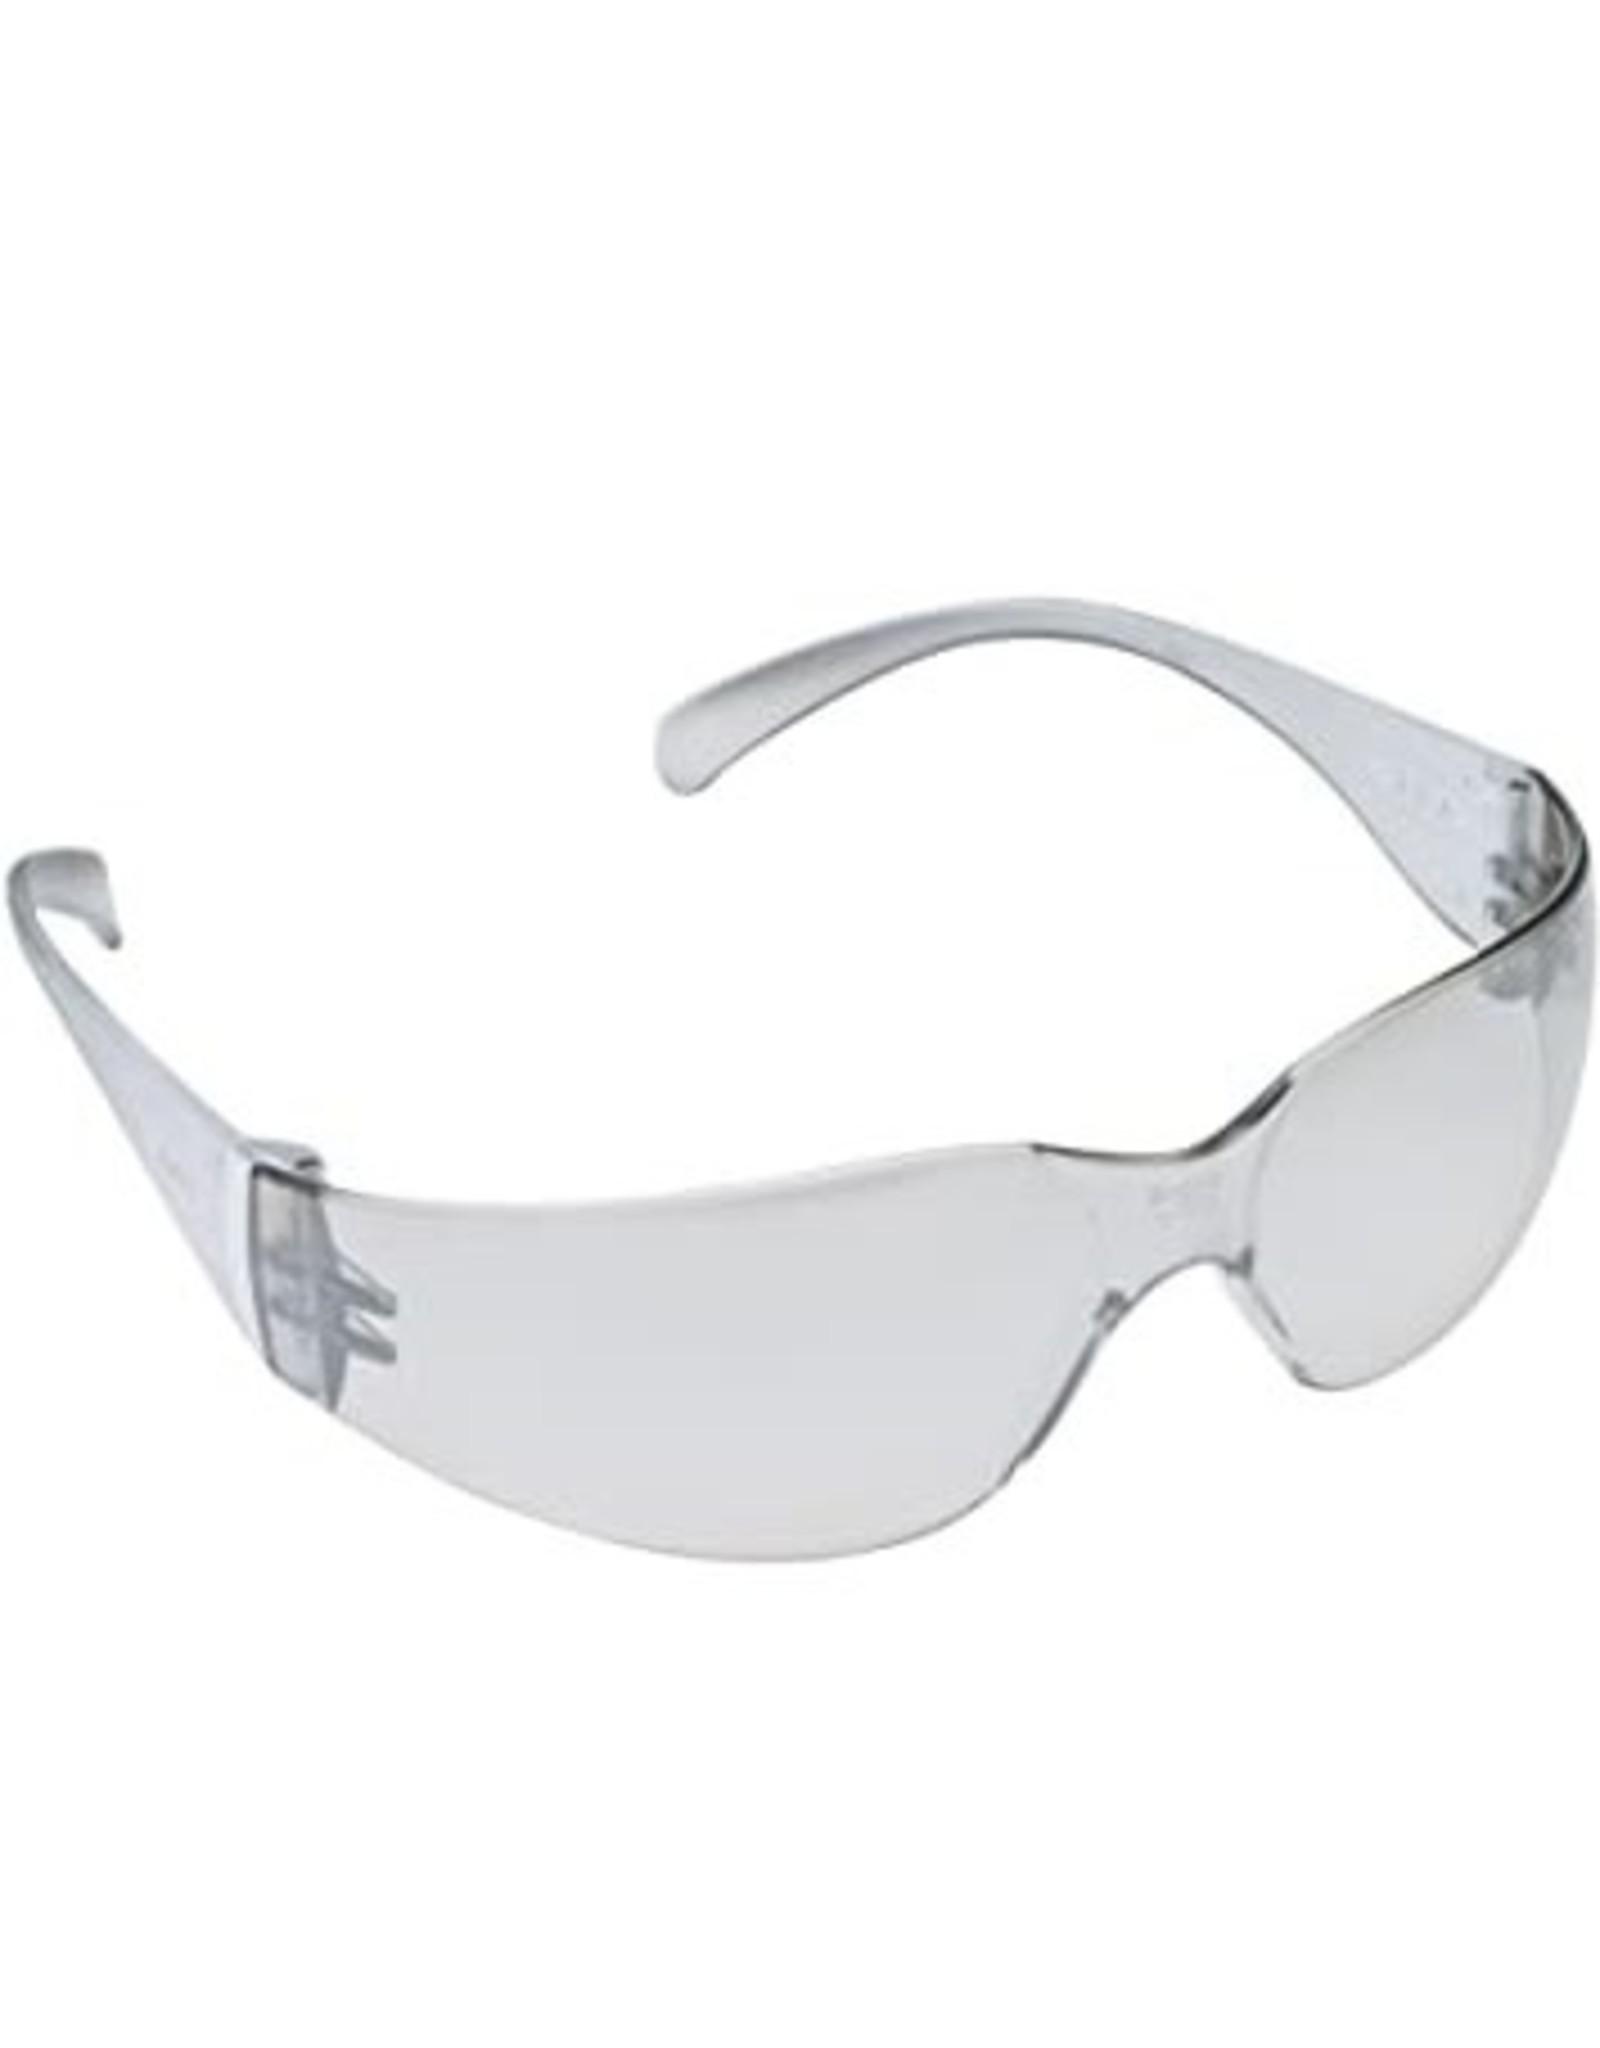 3M 3M Virtua Wraparound Polycarbonate Safety Glasses